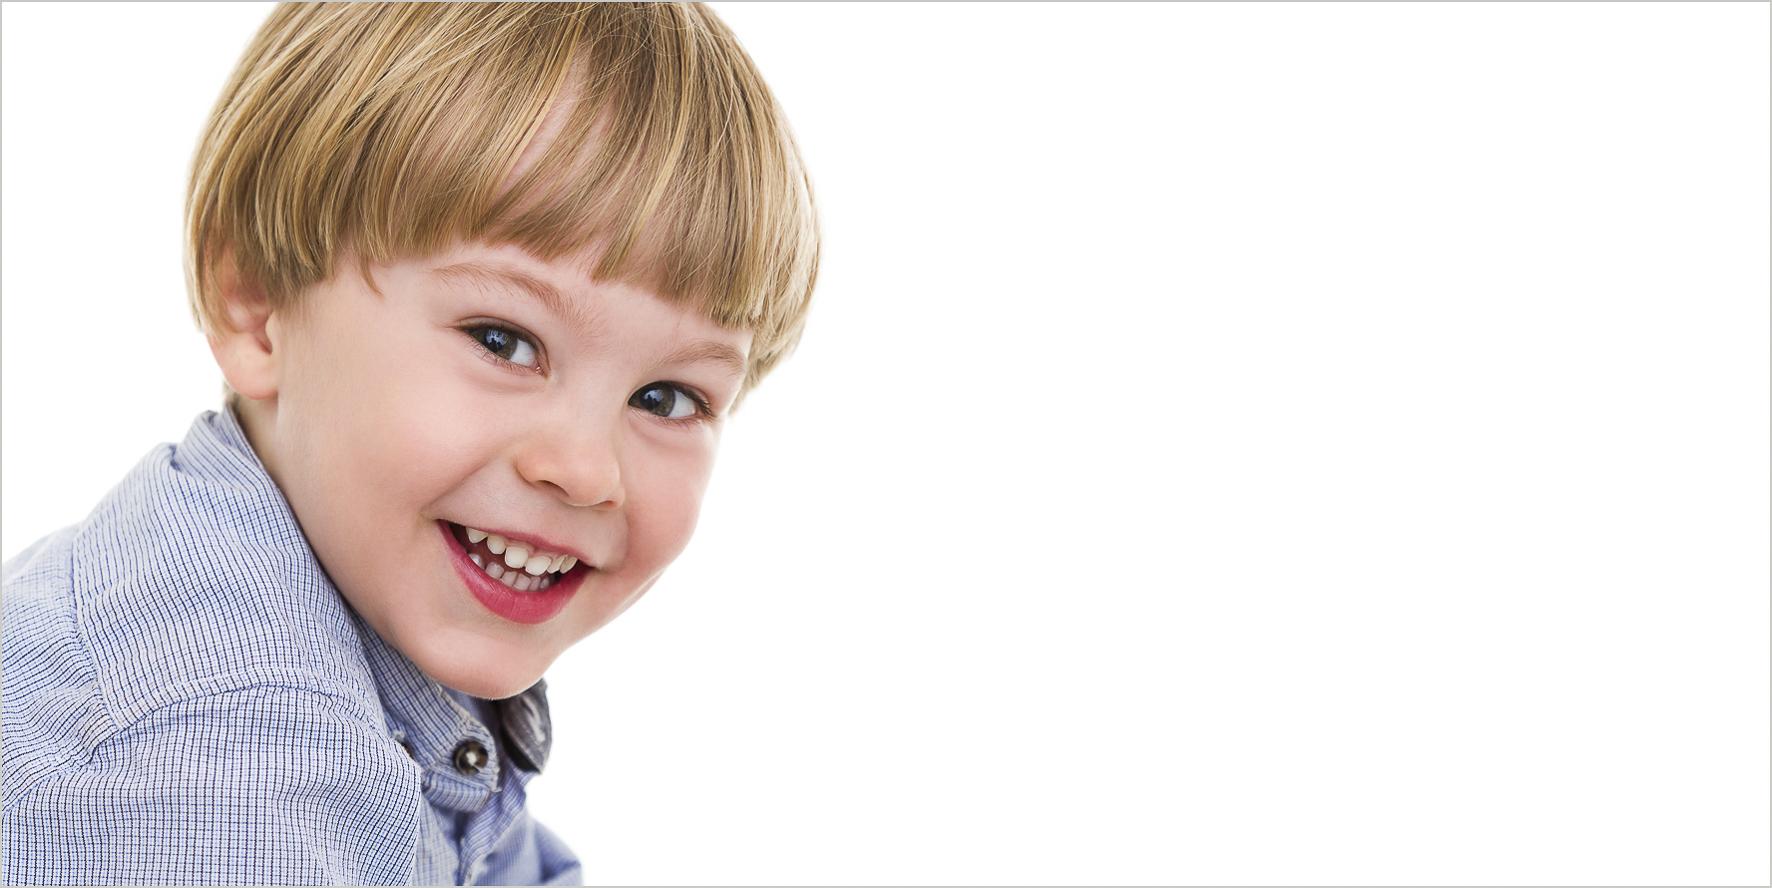 Familienfotografie Portrait lachender Junge in High Key kreativer Anschnitt